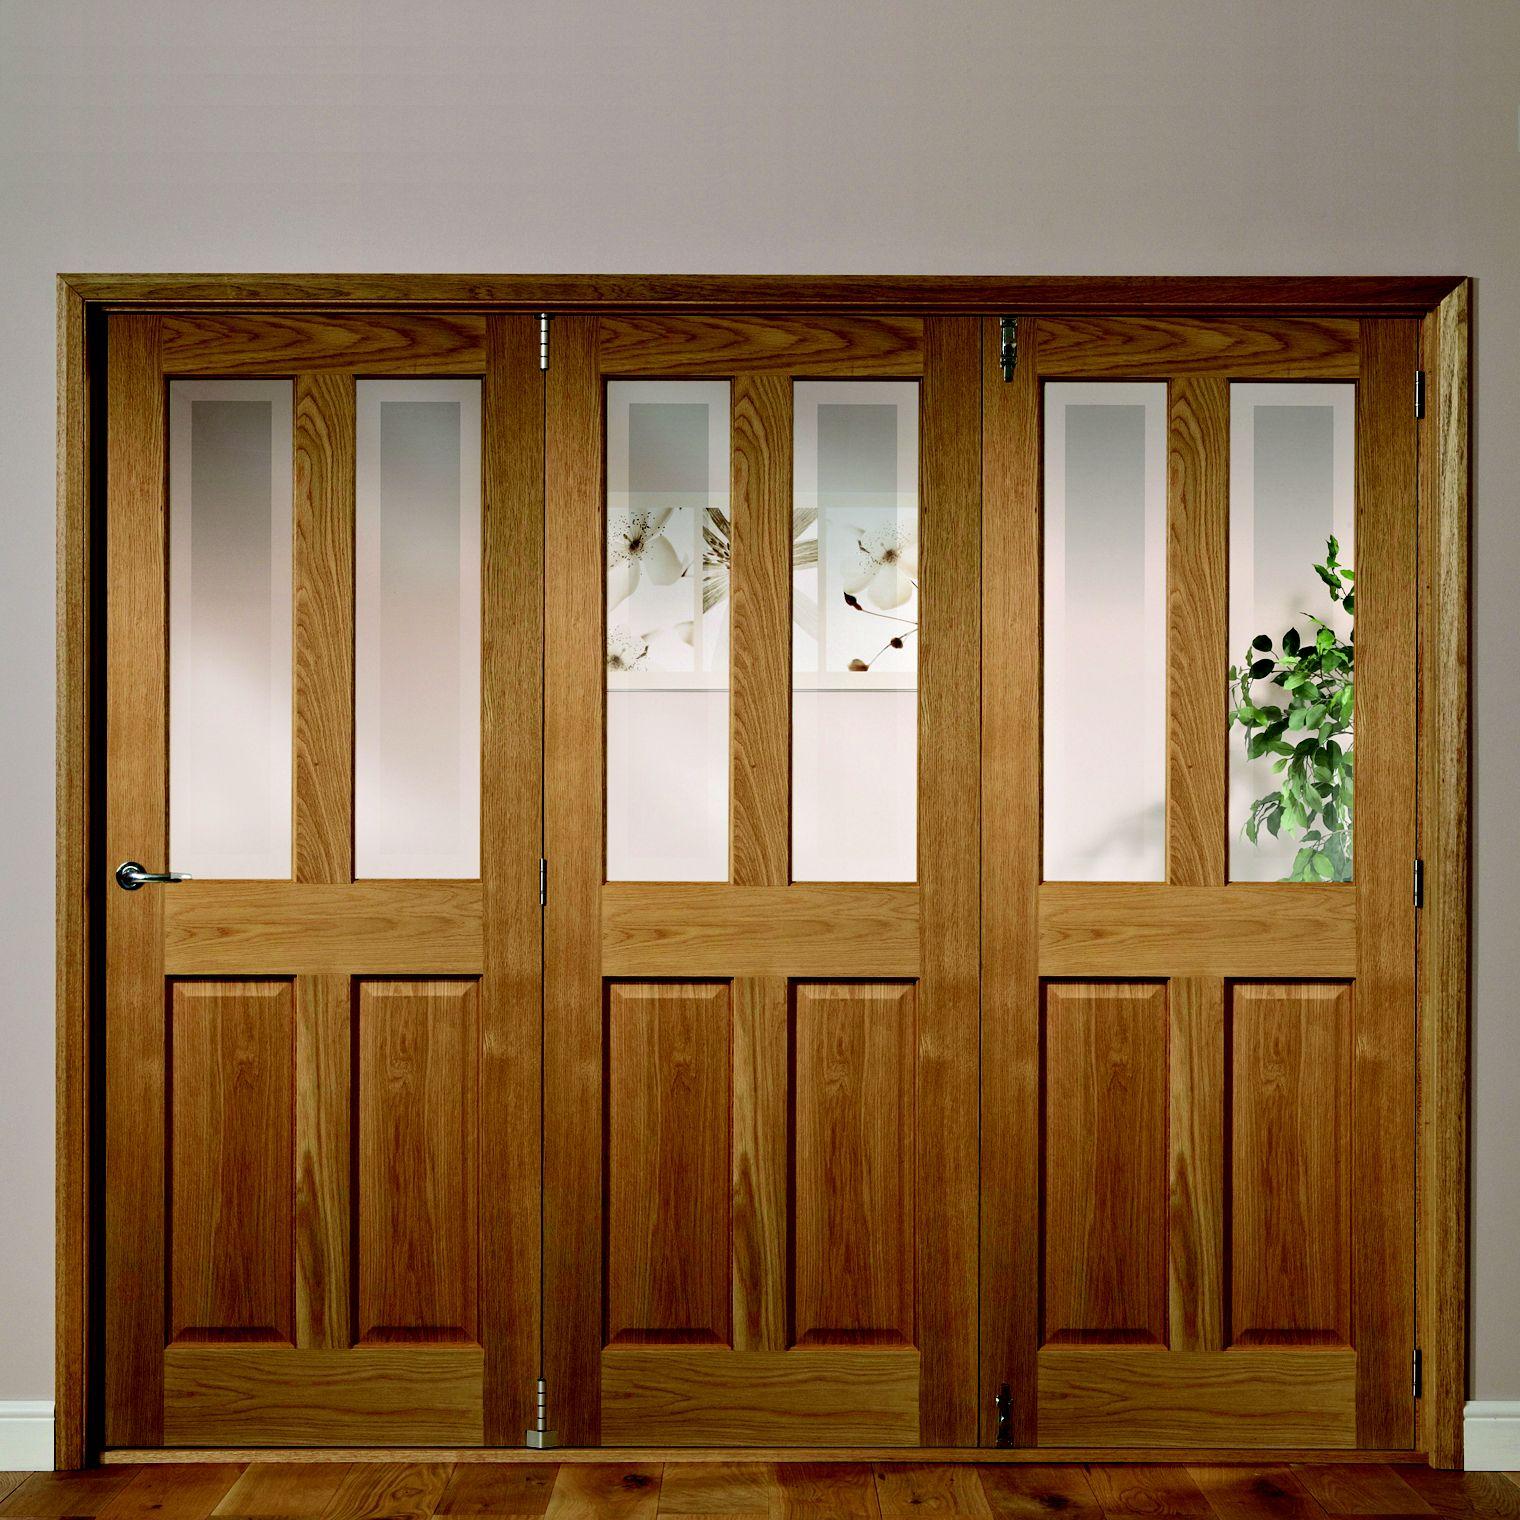 Elveden 4 Panel 2 Lite Oak Veneer Glazed Internal Folding Door Rh, (h)2035mm (w)2374mm